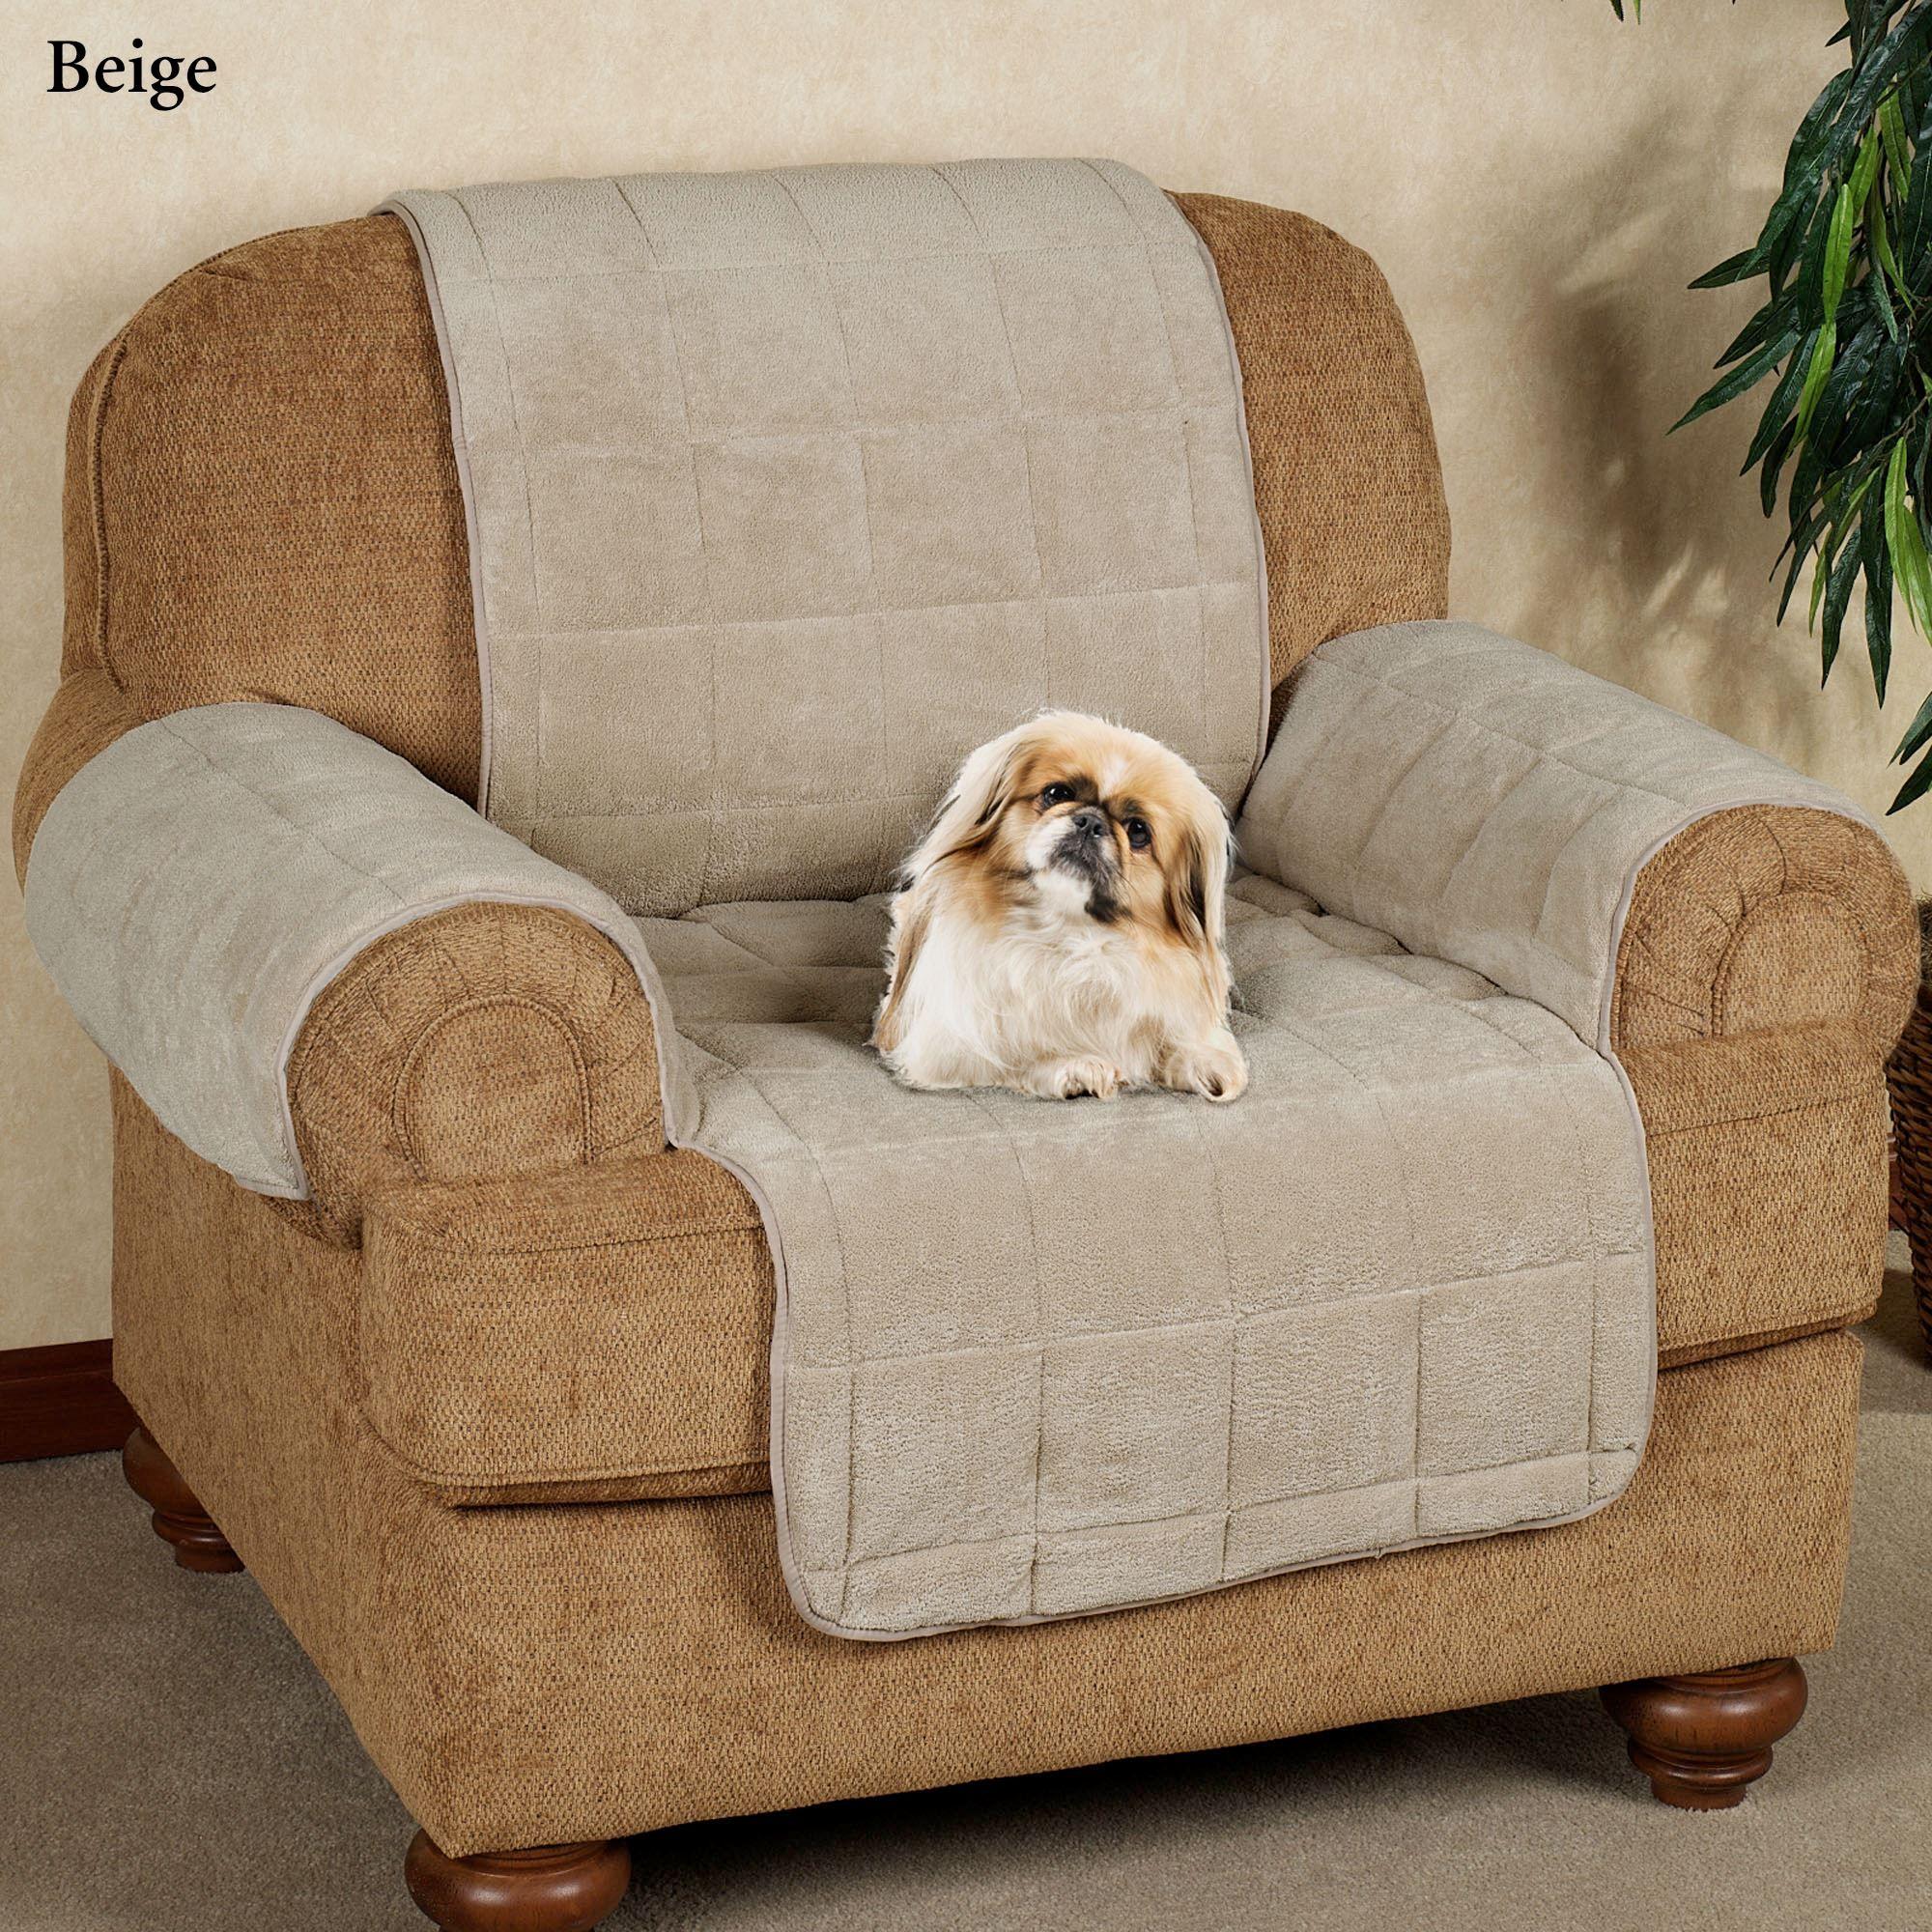 Super Microplush Pet Furniture Covers With Longer Back Flap Frankydiablos Diy Chair Ideas Frankydiabloscom